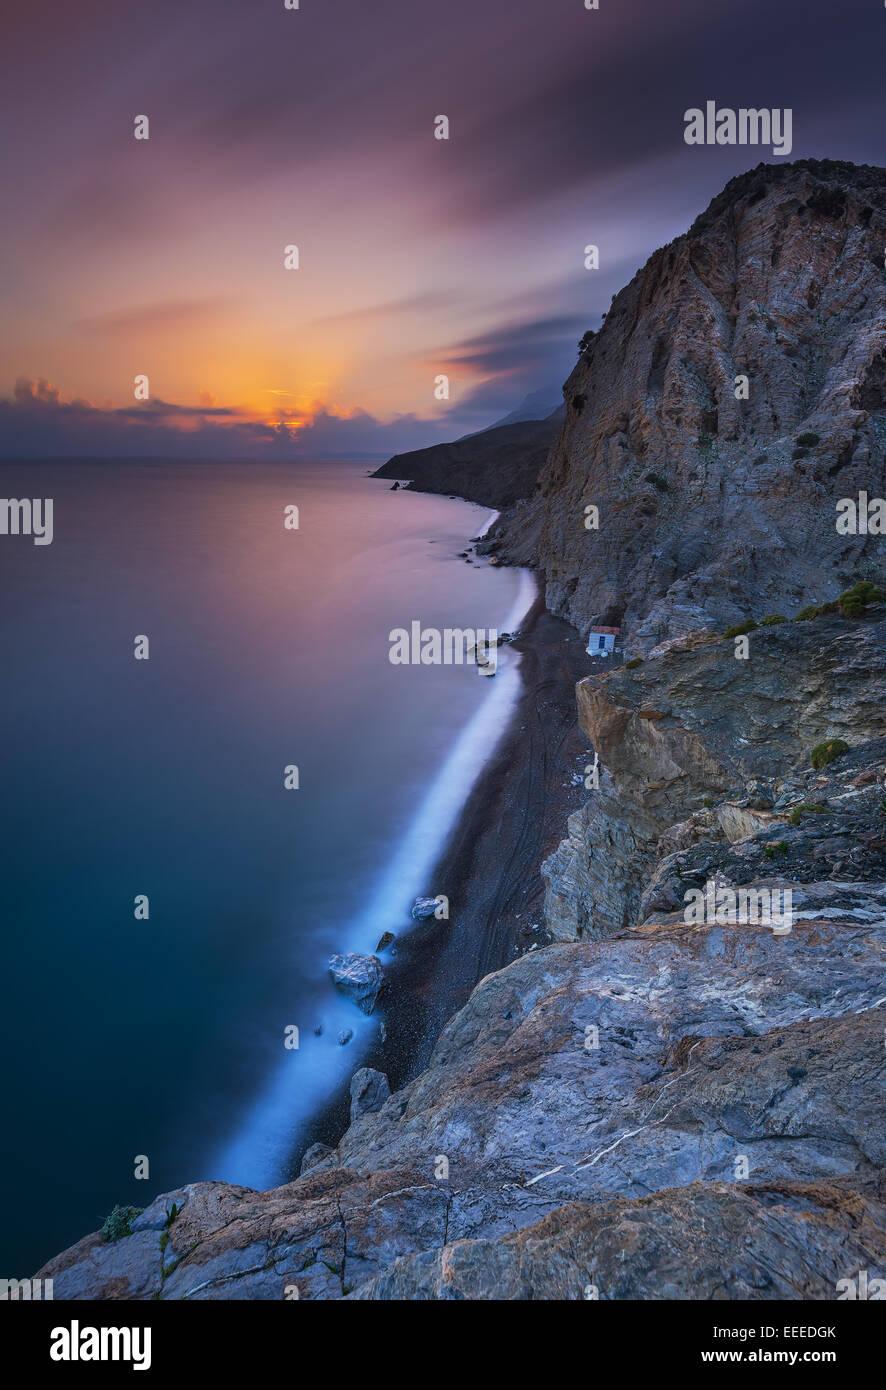 Therma beach in Kos island Greece - Stock Image